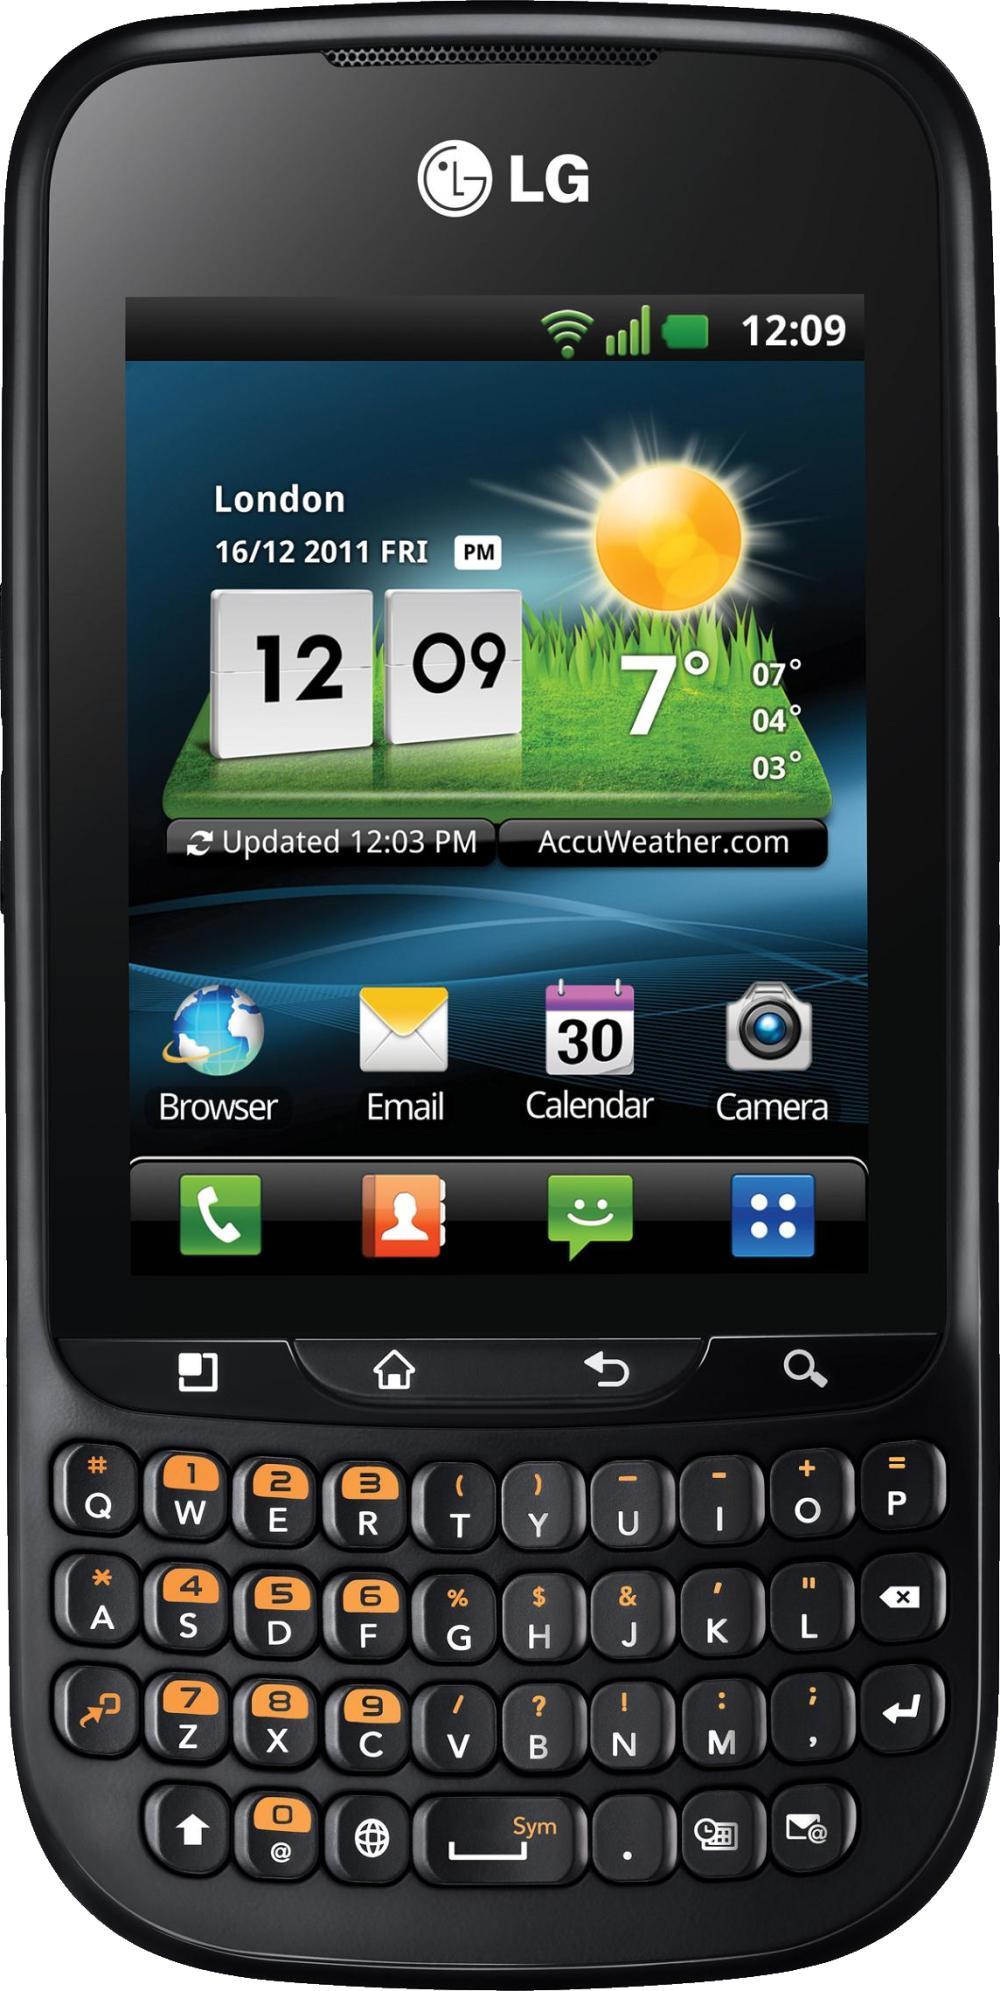 LG Gossip Pro C660